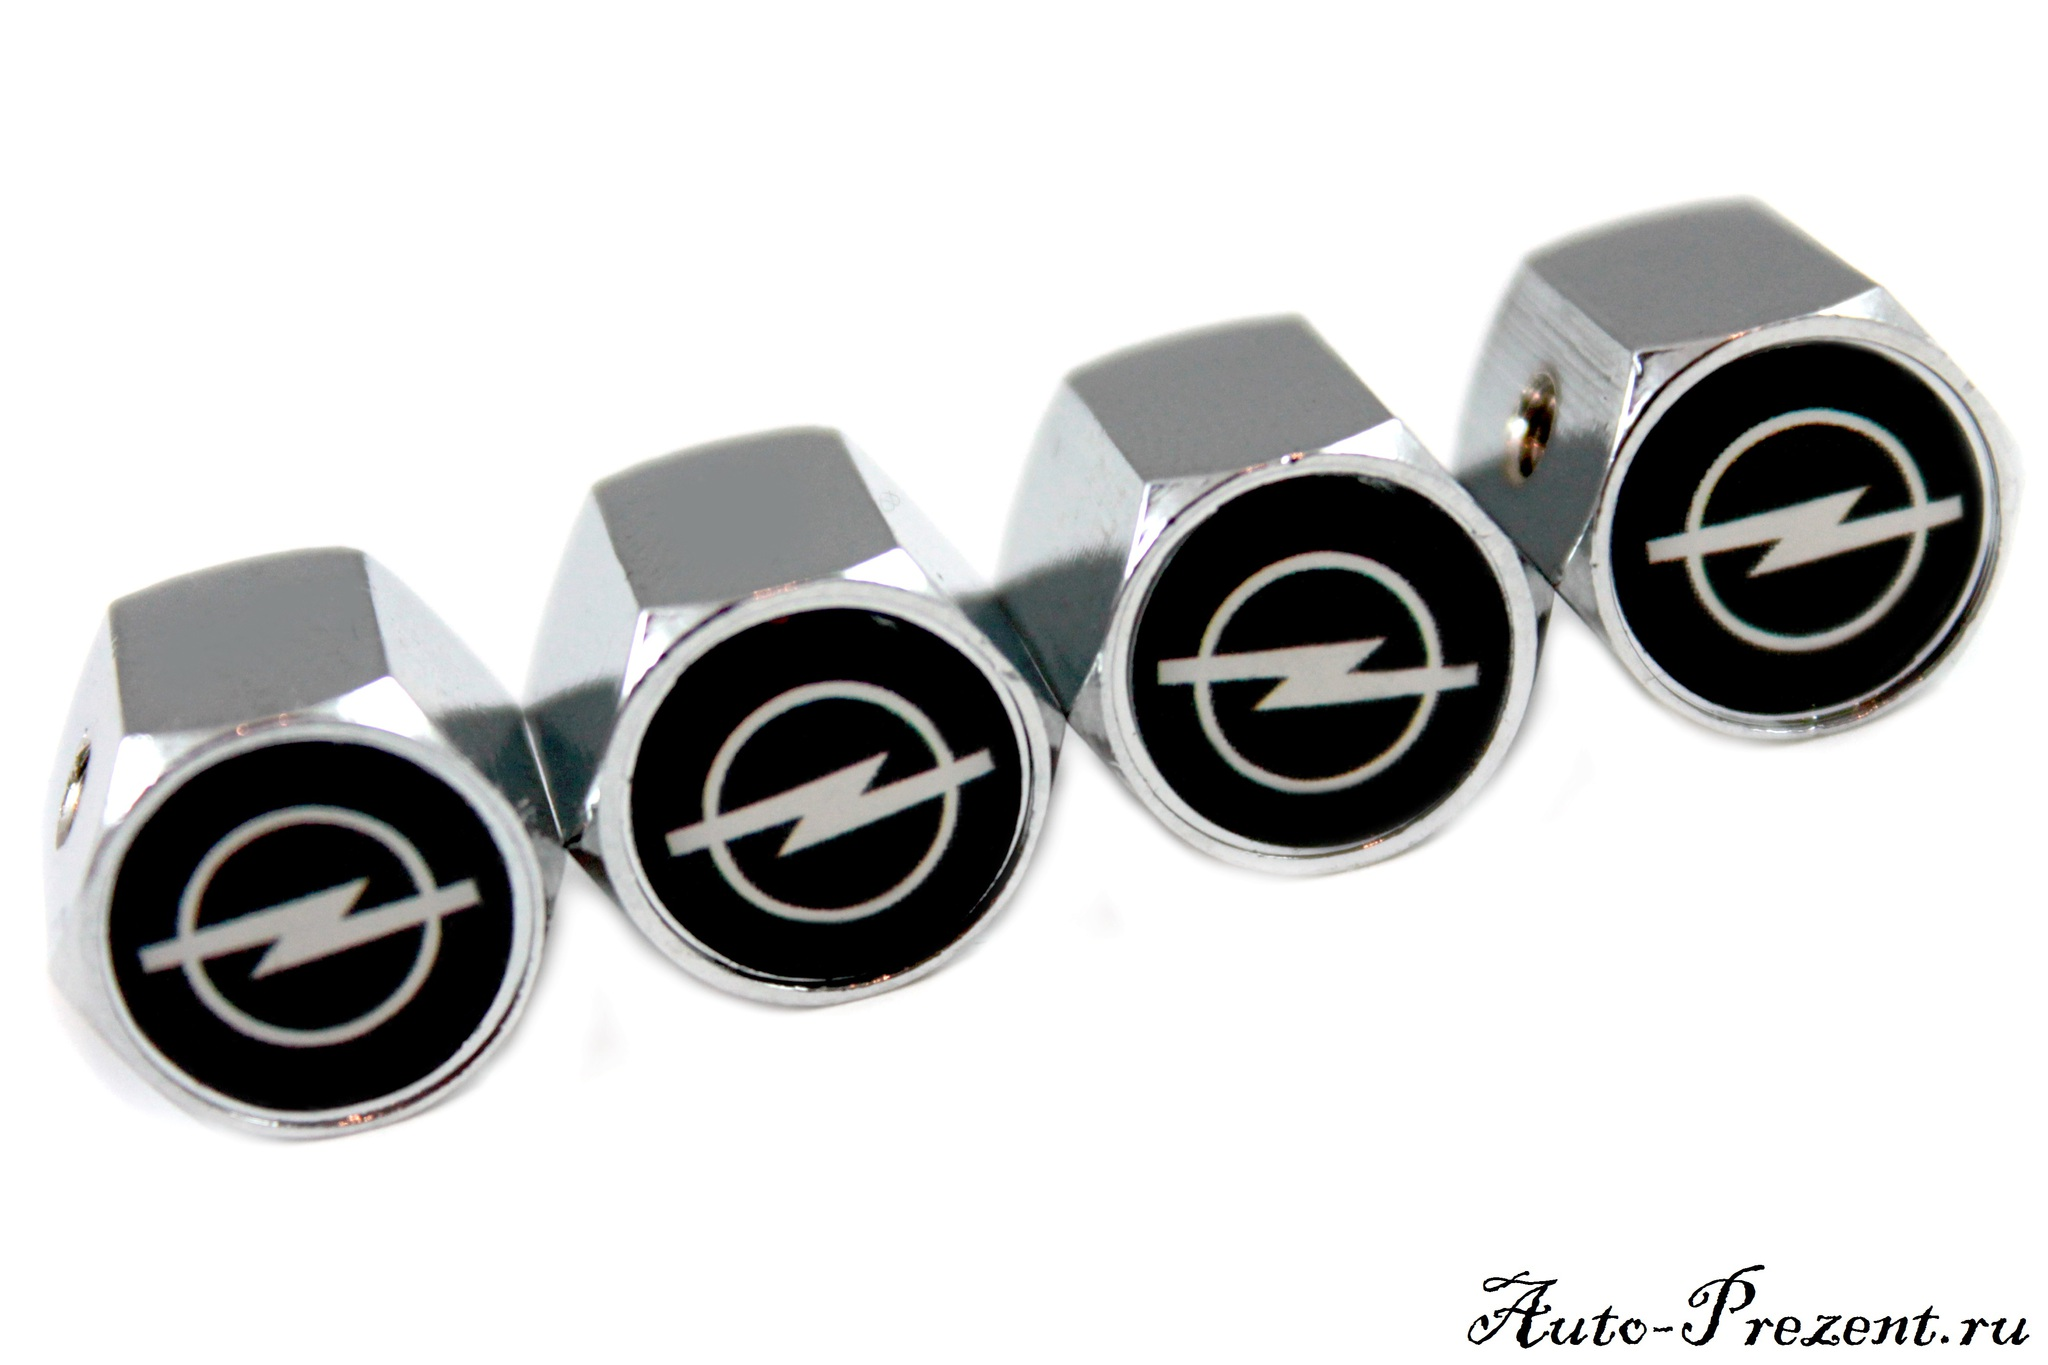 Колпачки на ниппель OPEL с защитой от кражи